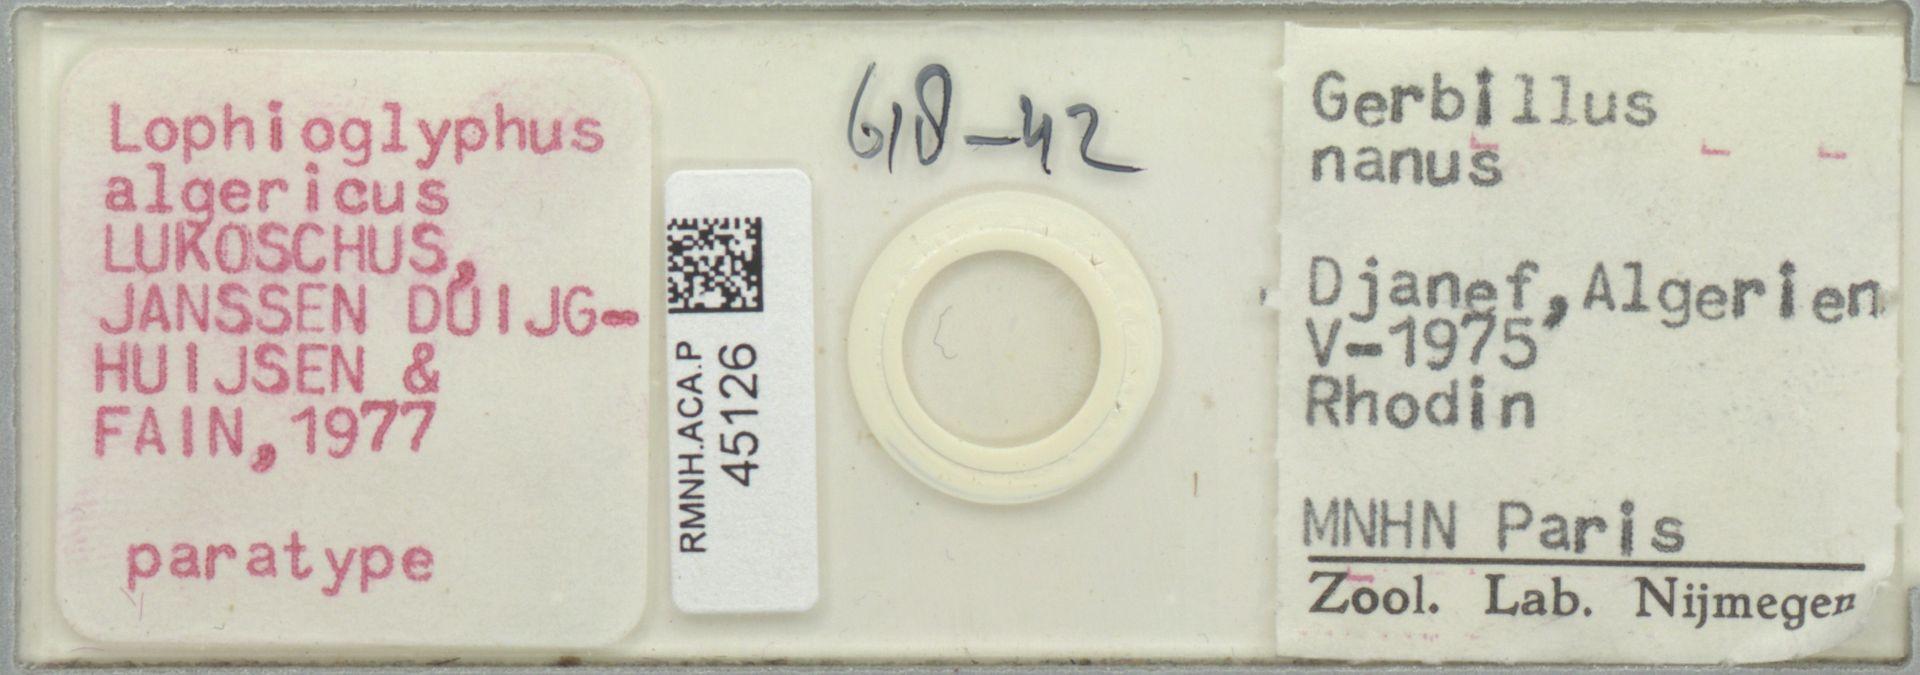 RMNH.ACA.P.45126 | Lophioglyphus algericus Lukoschus, Janssen Duijghuijsen & Fain, 1977